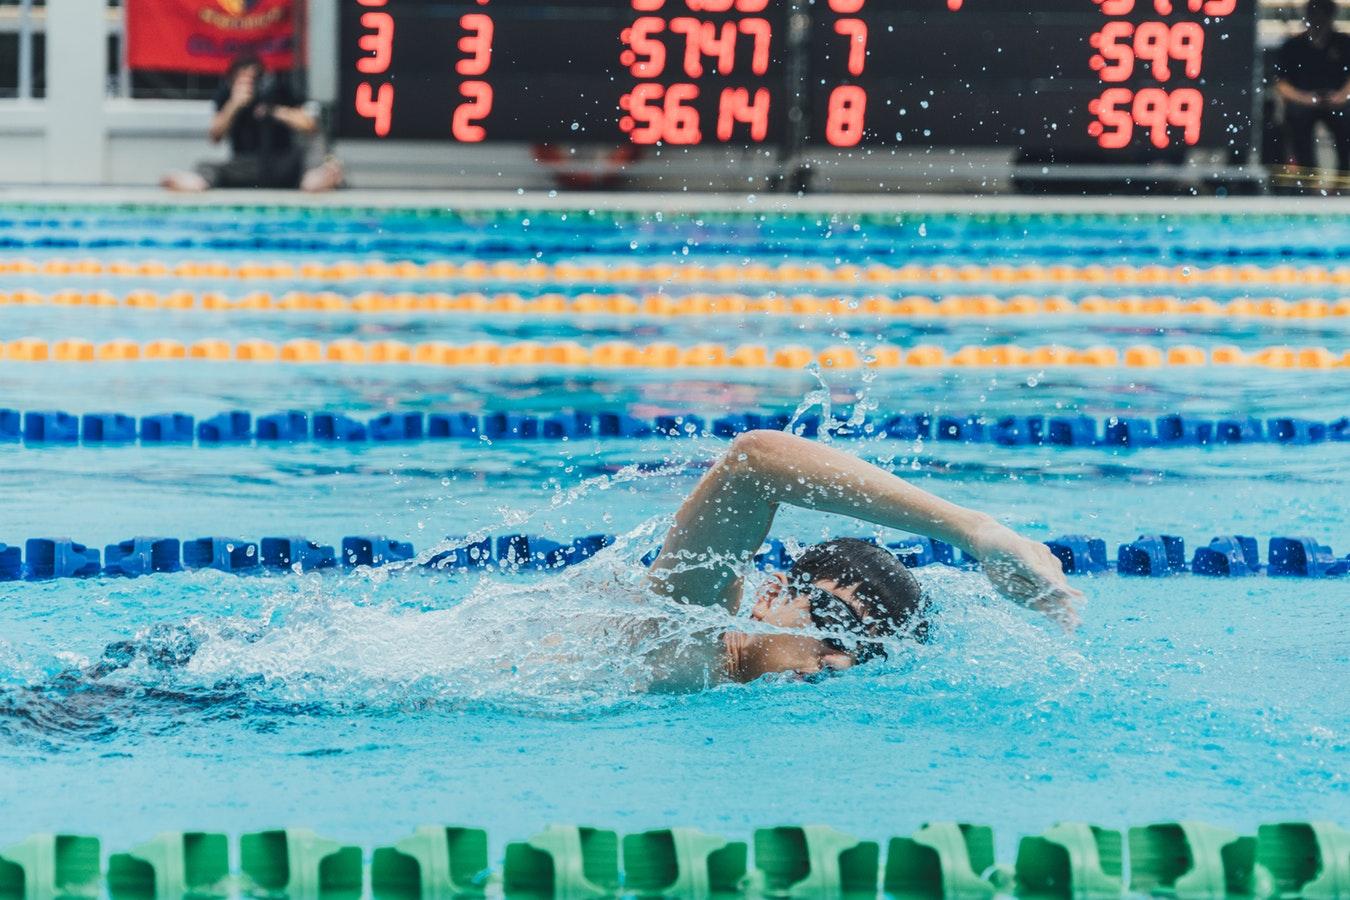 swimmer racing